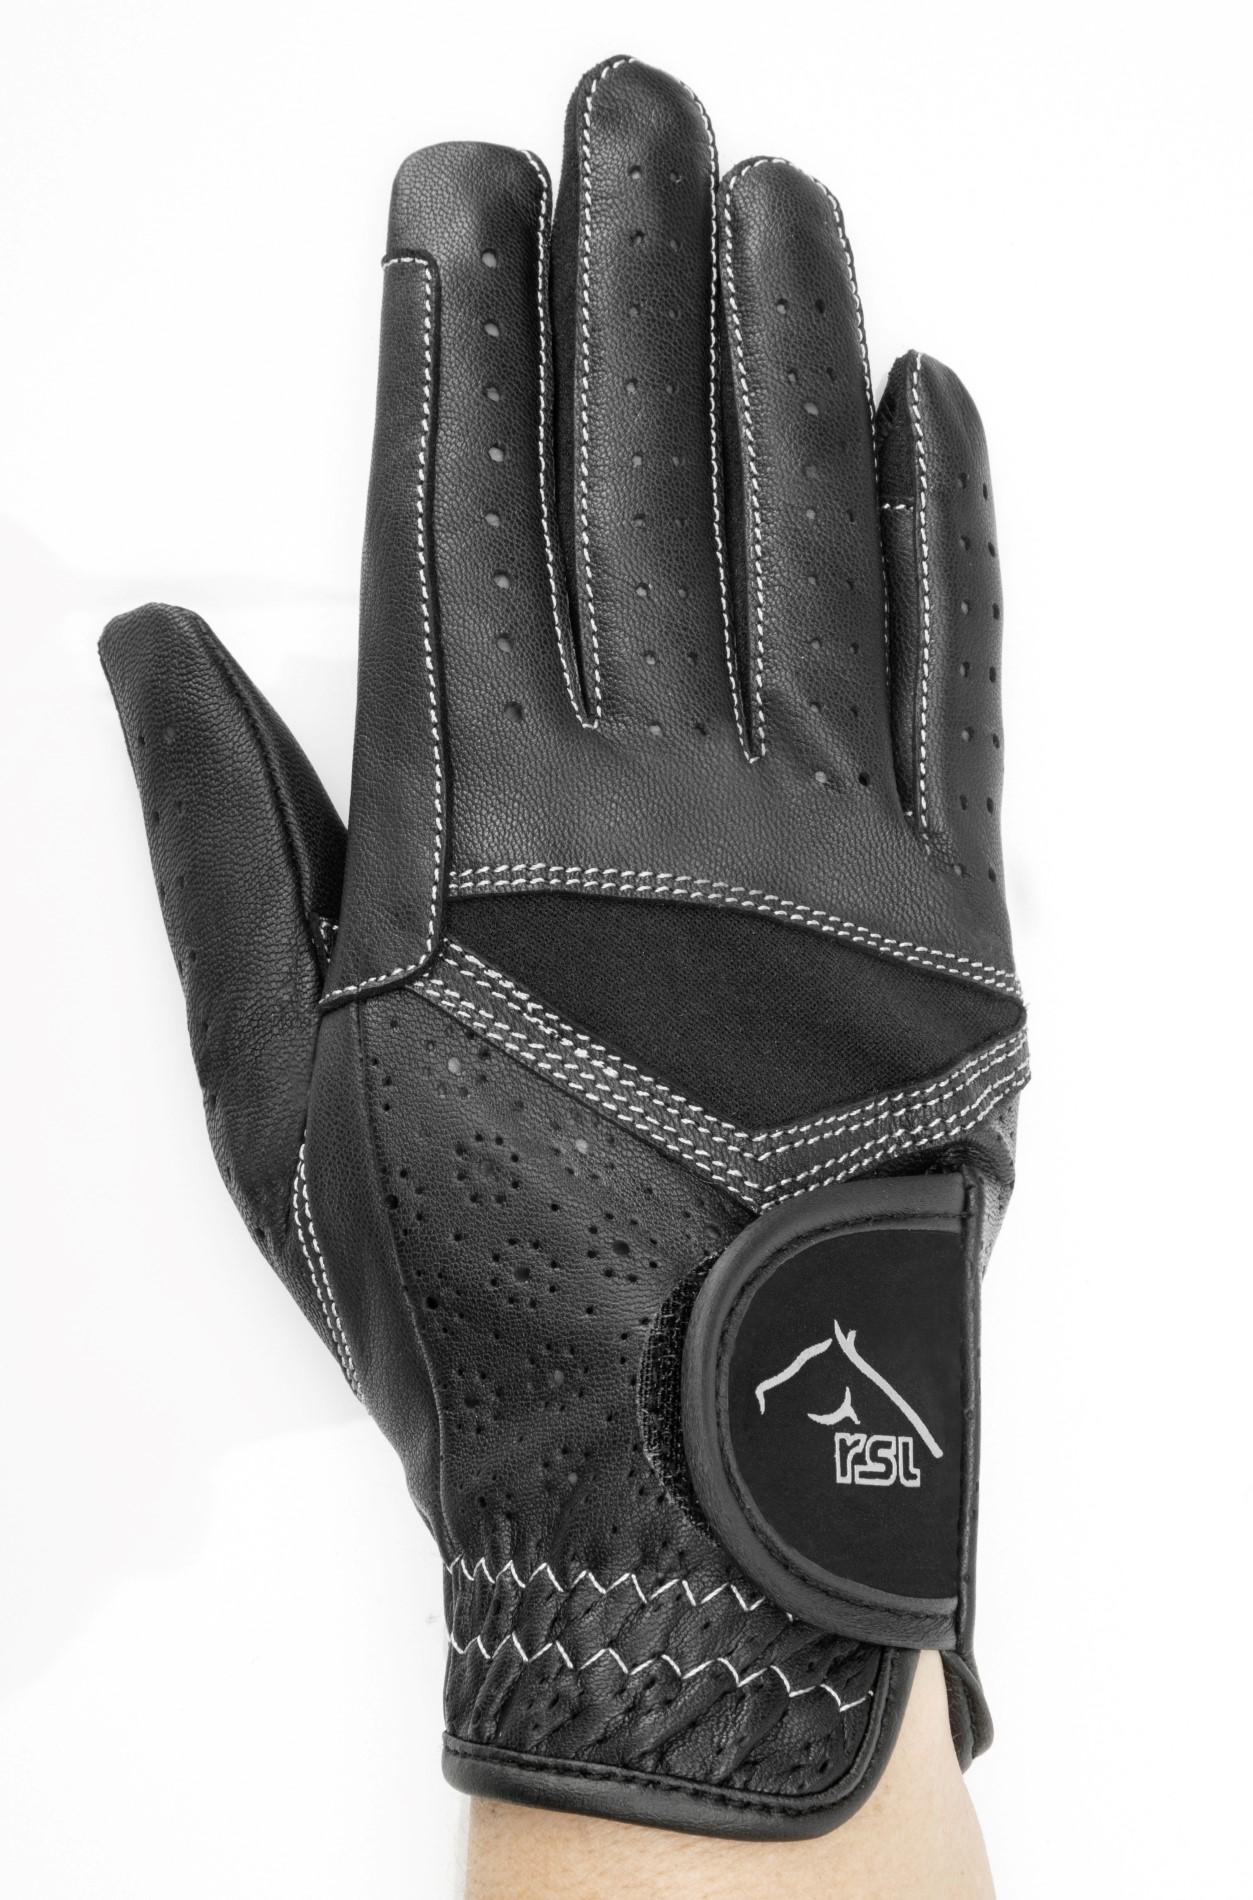 USG Cardiff Riding Gloves